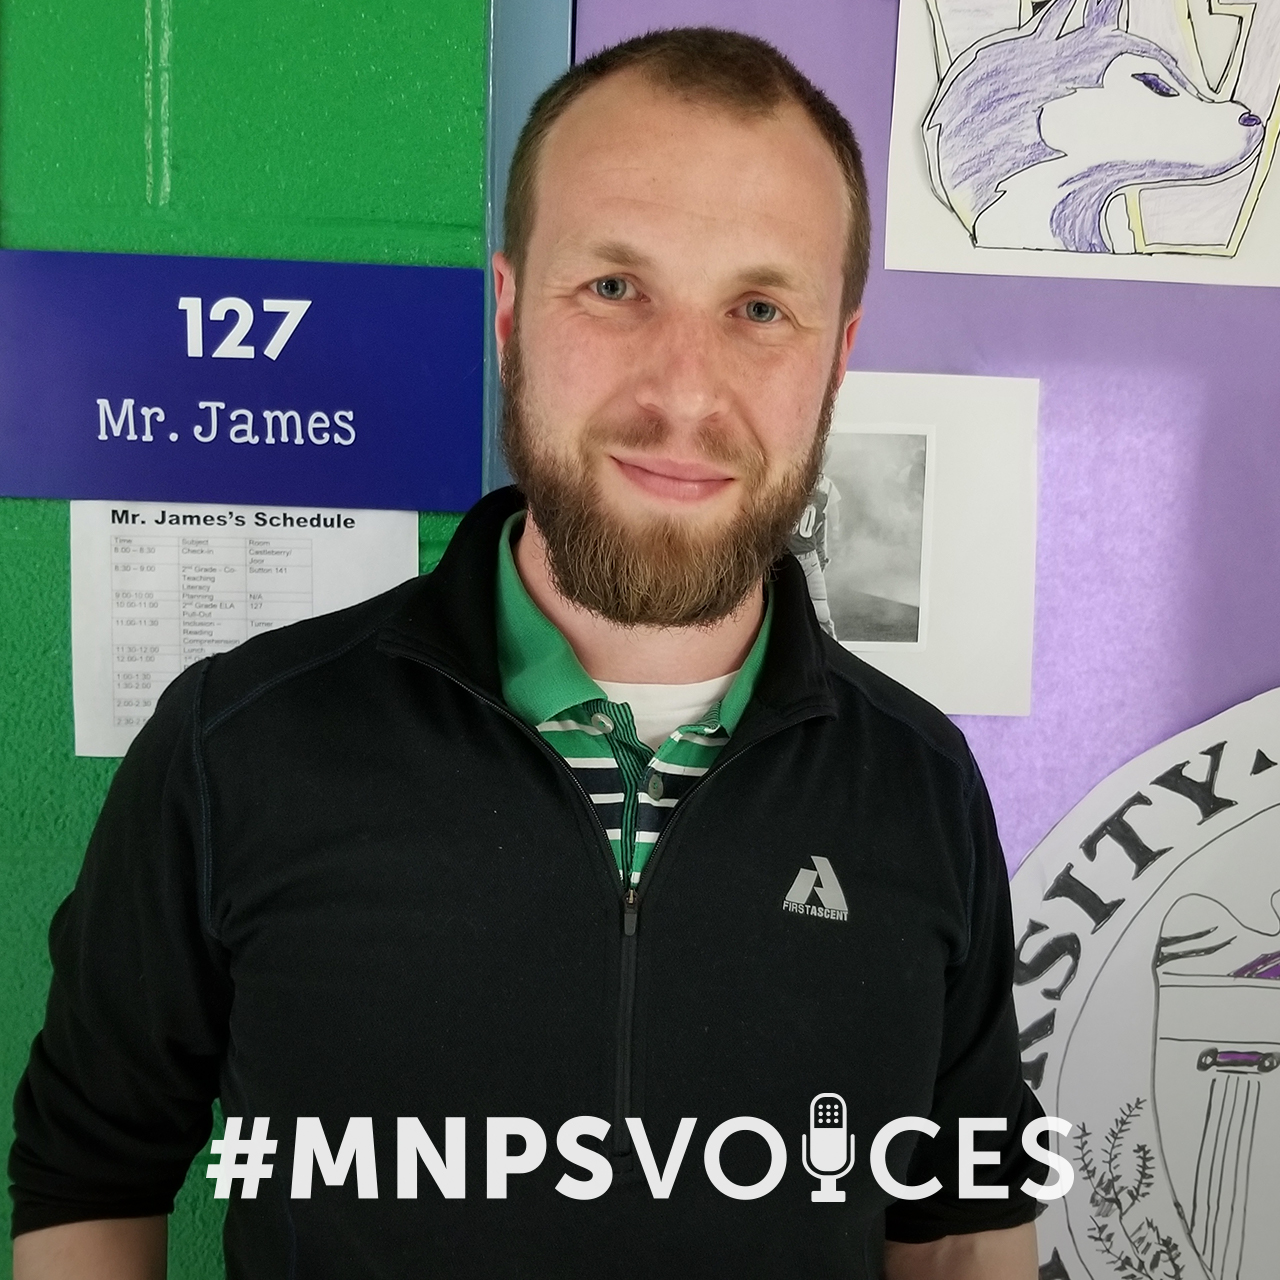 MNPSVoices_050119_NathanaelJames.jpg